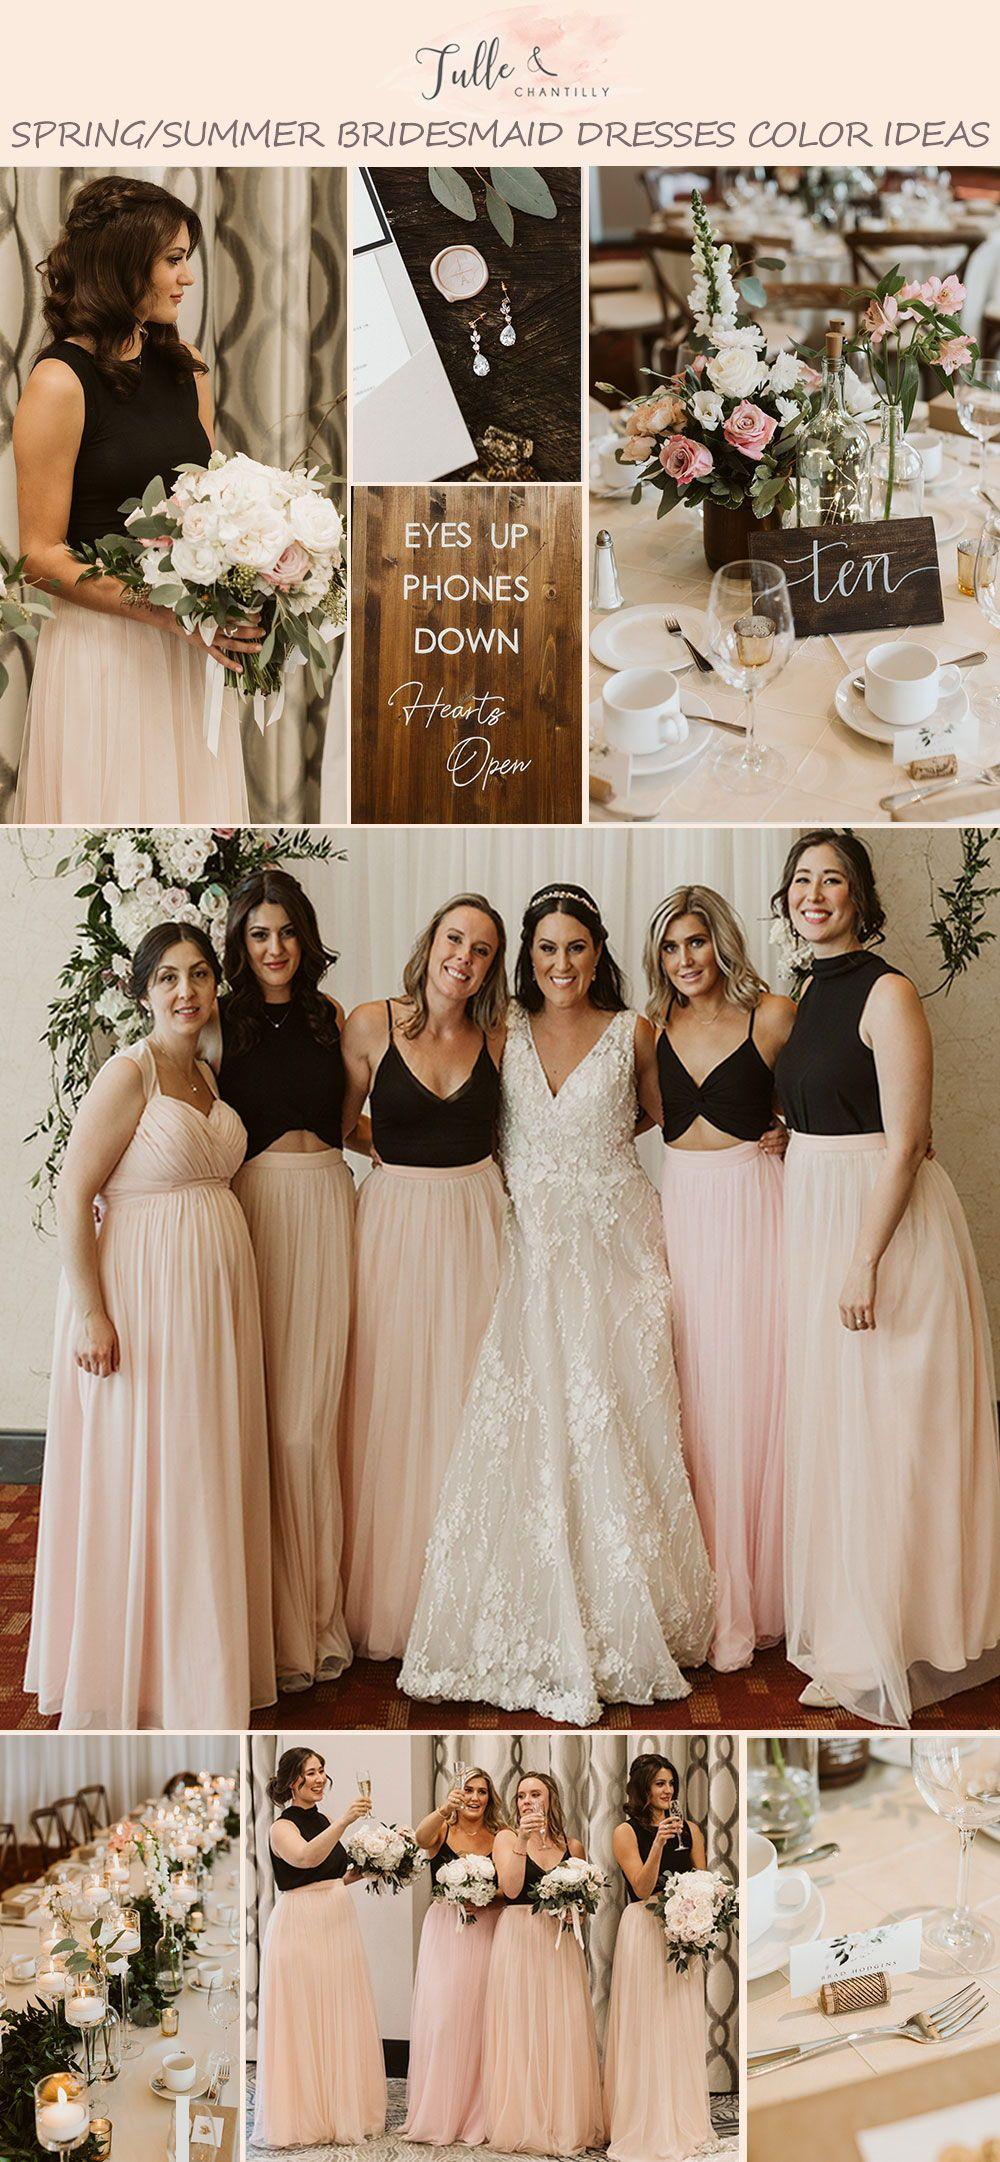 Long Short Bridesmaid Dresses 79 149 Size 0 30 And 50 Colors In 2021 Custom Bridesmaid Dress Summer Bridesmaid Dresses Bridesmaid Dresses [ 2162 x 1000 Pixel ]